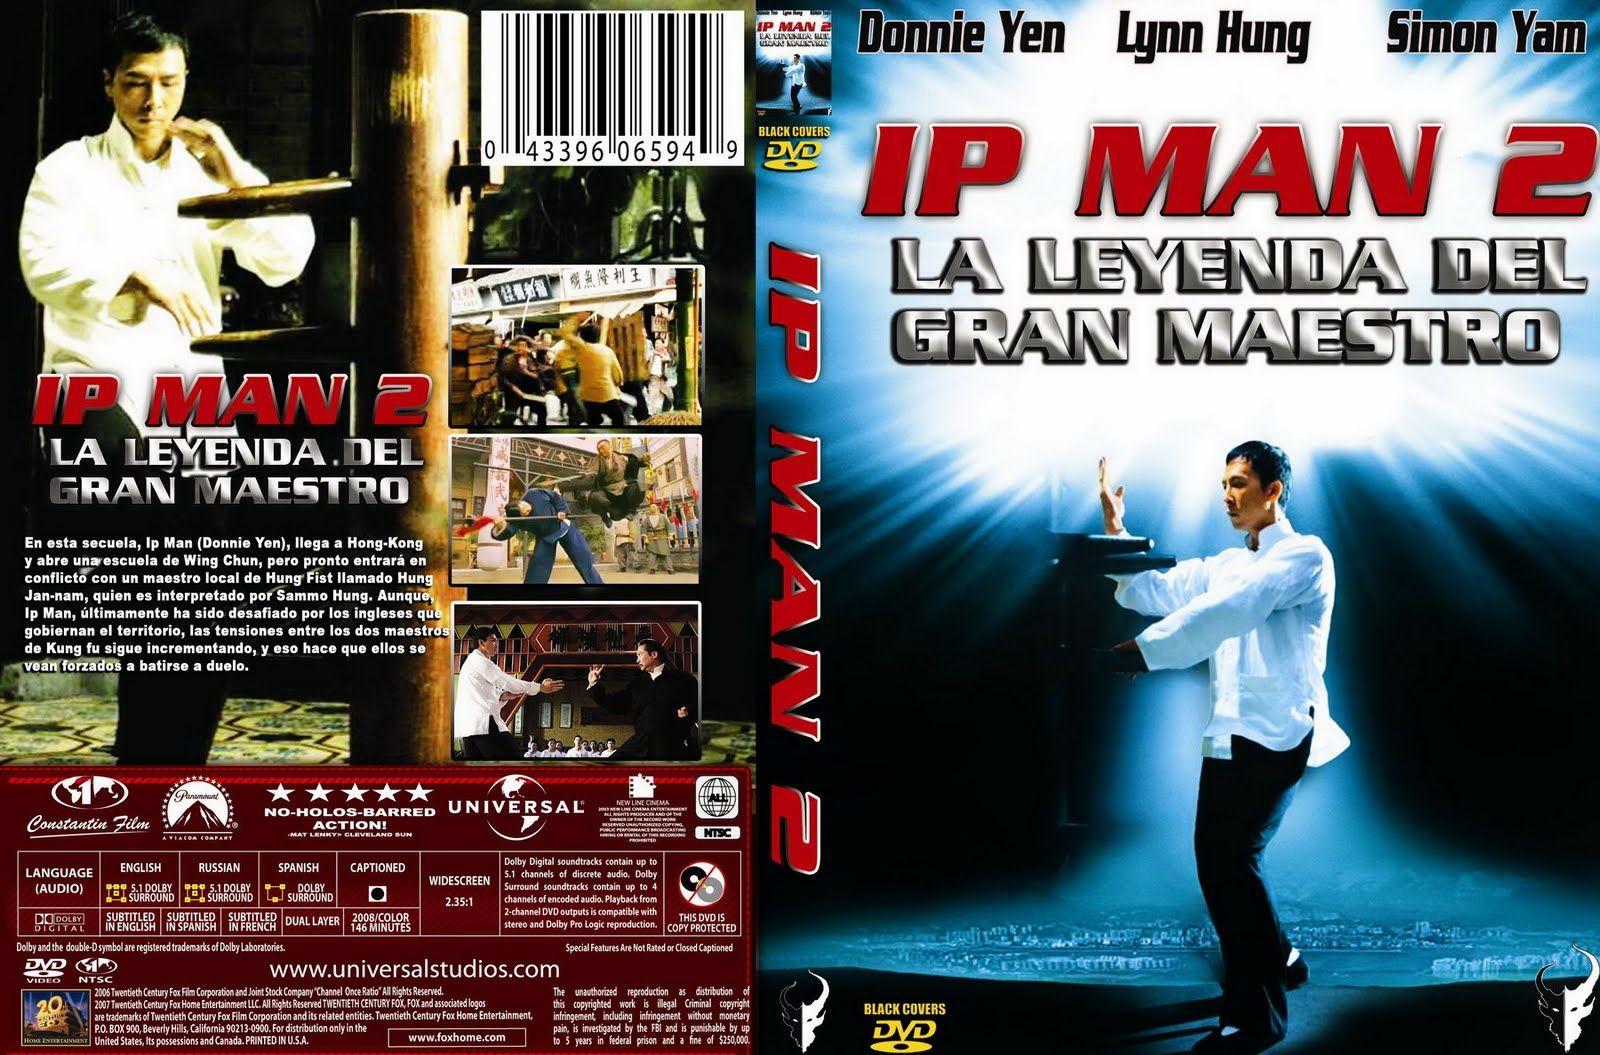 Ip Man 2 La Leyenda Del Gran Maestro Latino 2010 Ip Man Peliculas En Español Latino Peliculas En Español